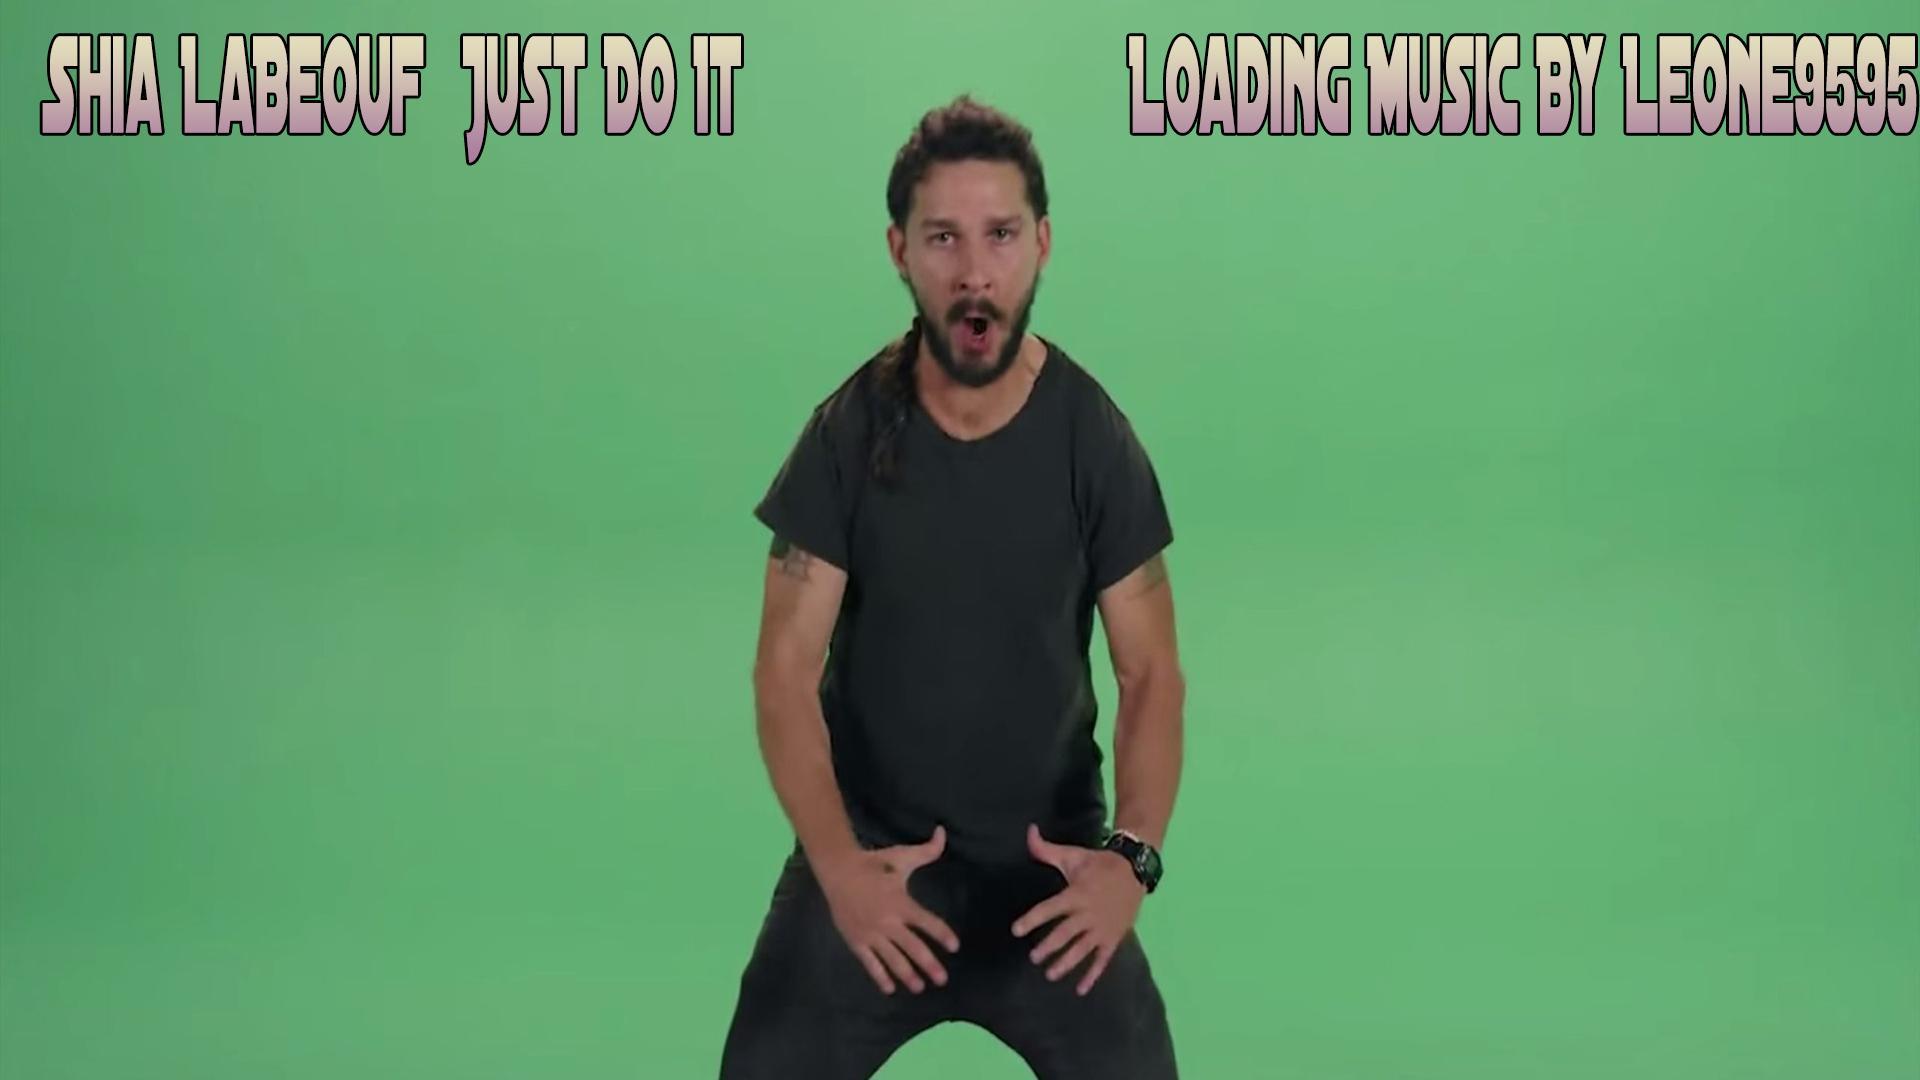 Shia LaBeouf Just Do It Loading Music - GTA5-Mods.com